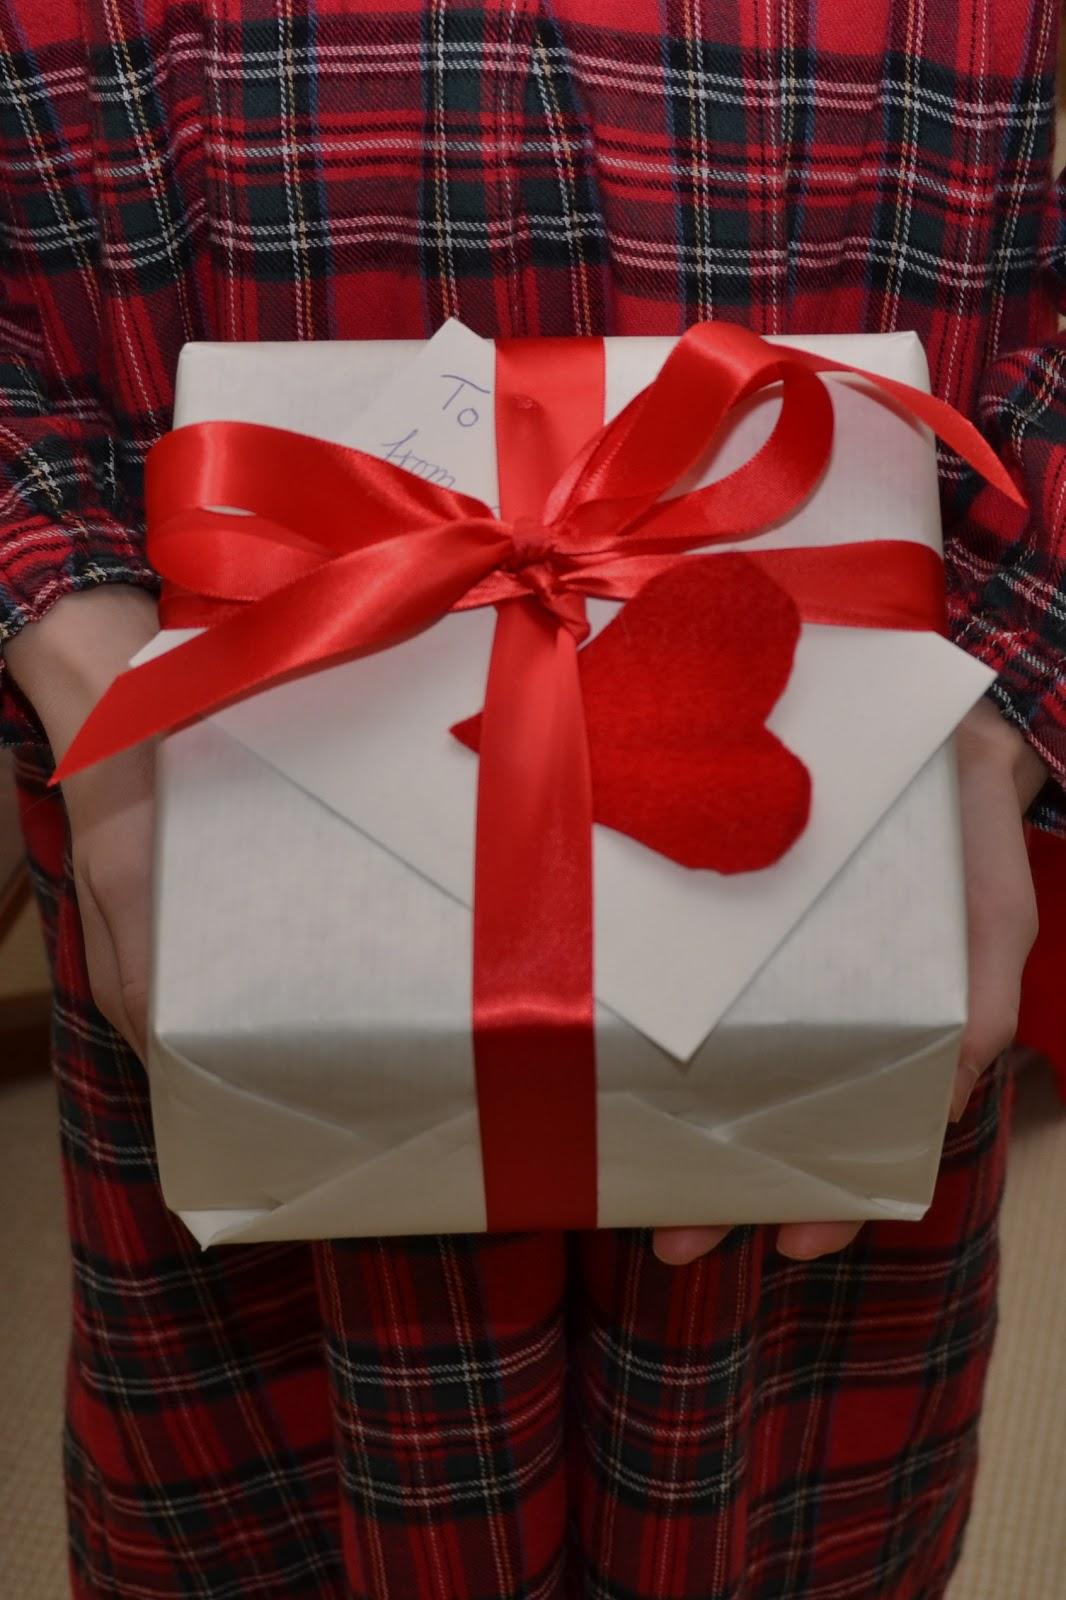 The Princess and The Frog Blog: An Early Christmas Gift